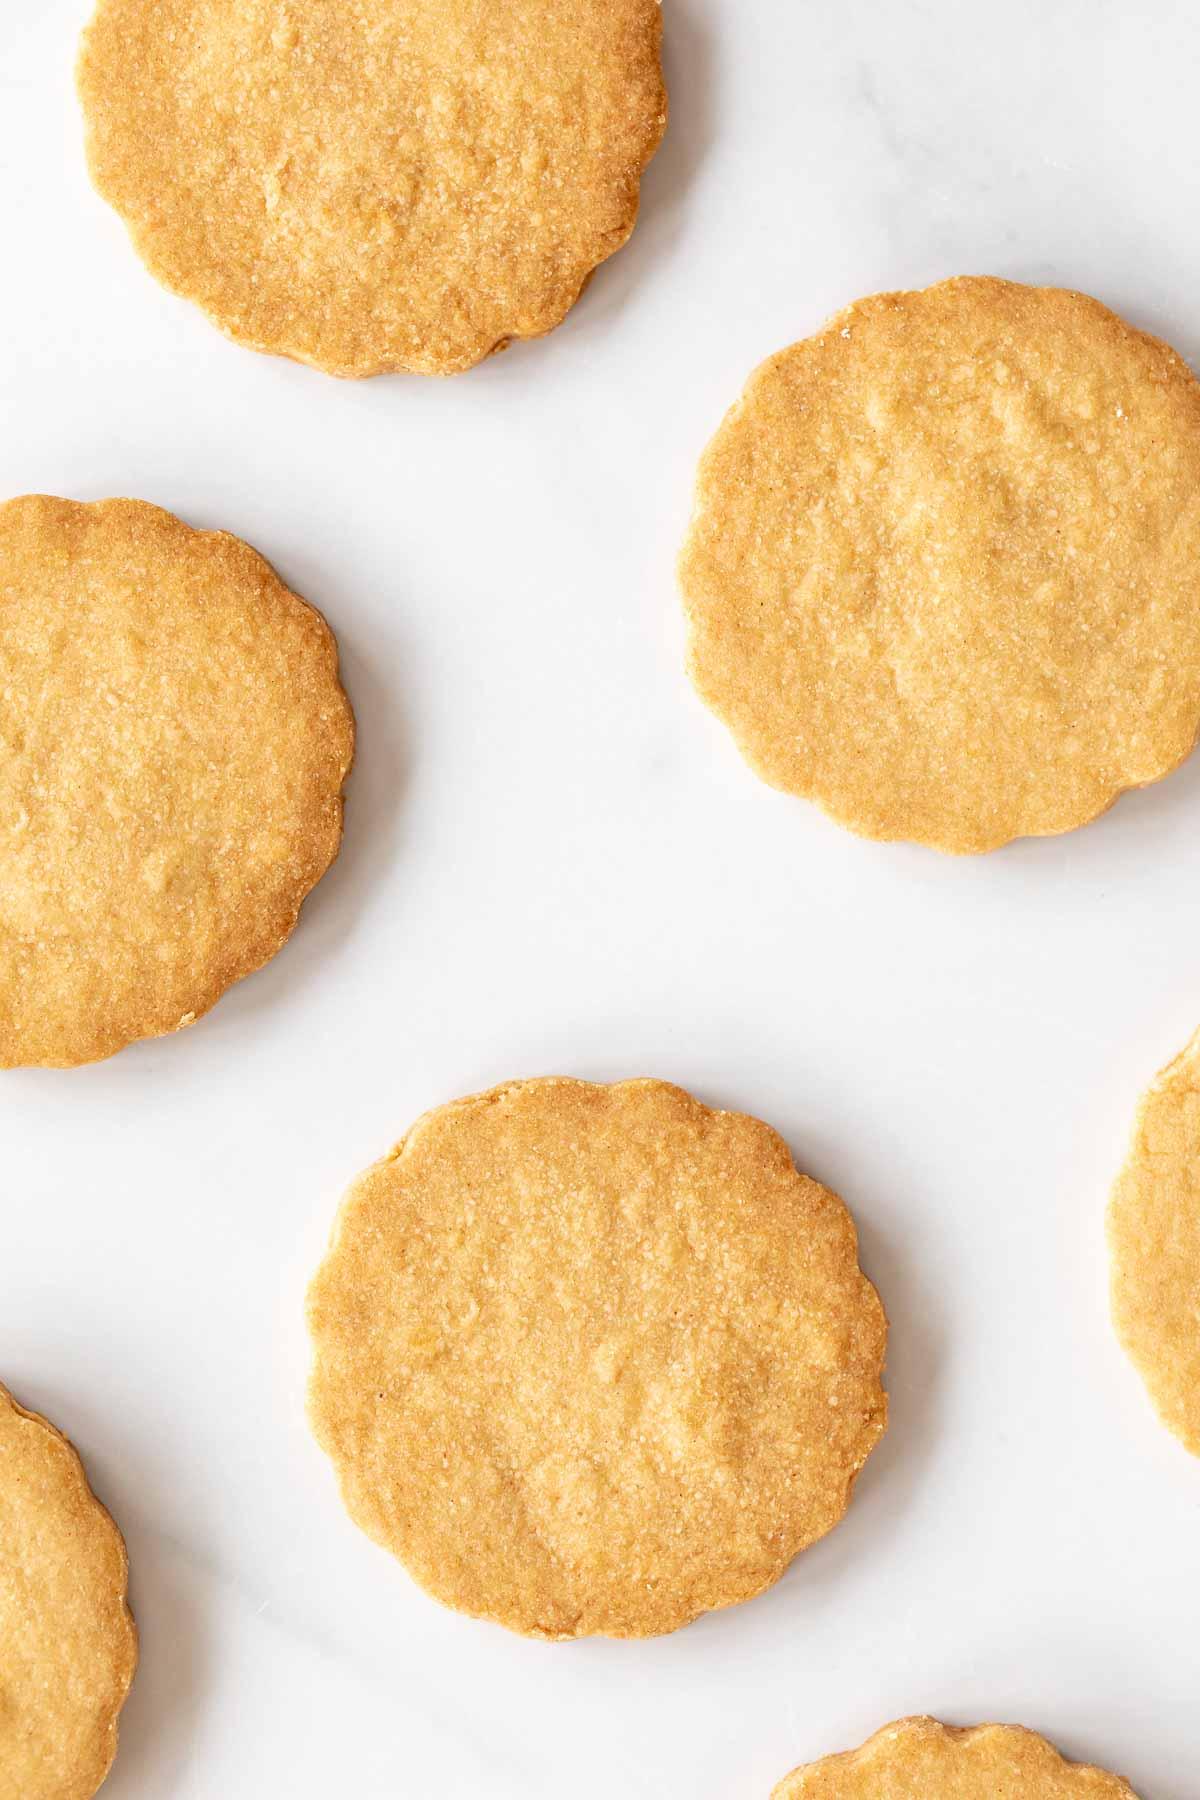 peanut butter shortbread cookies with crispy edges